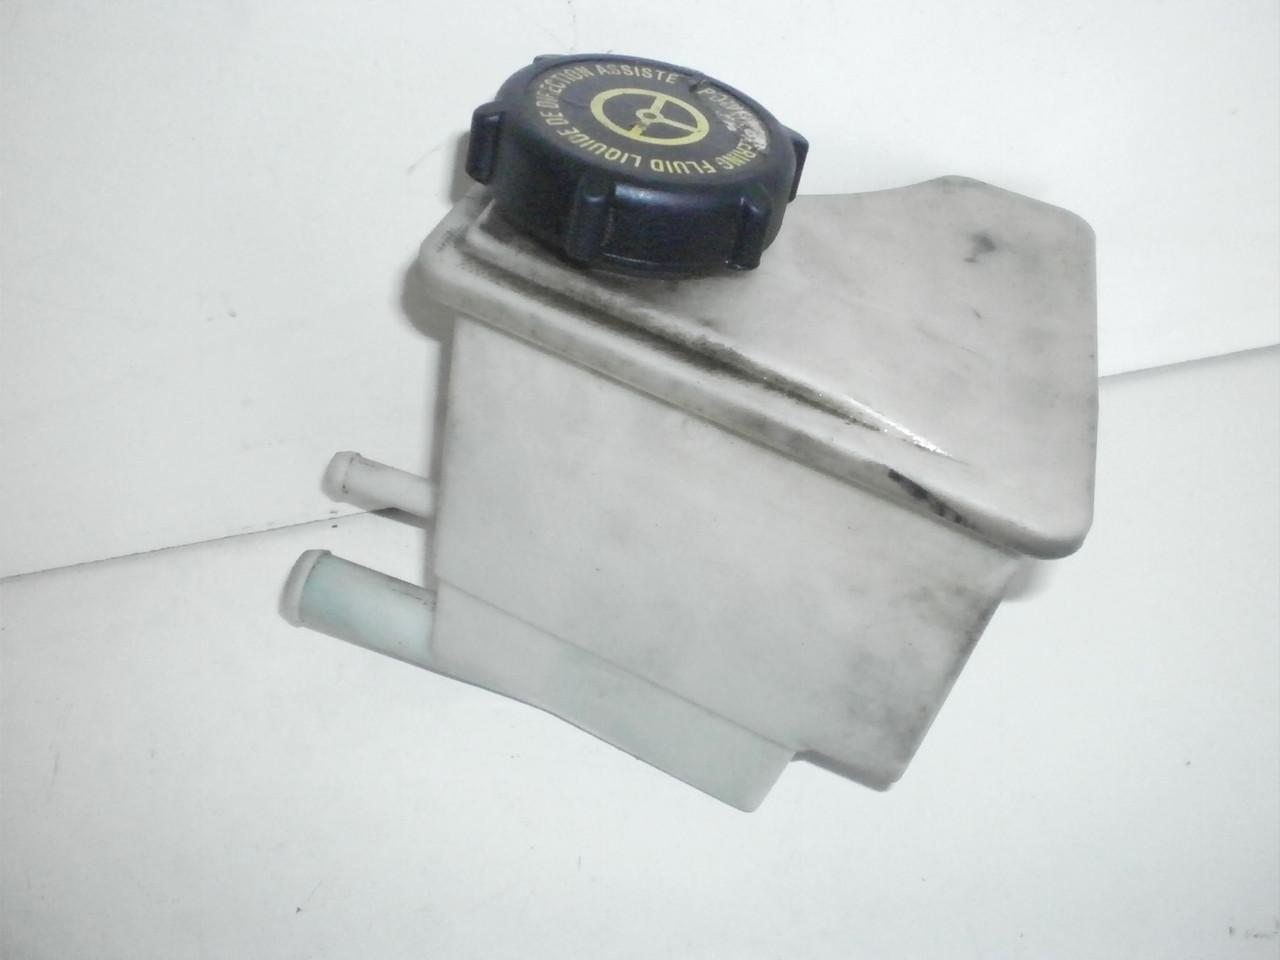 1998 2000 Ford Contour Mercury Cougar 2 5 V6 Power Steering Pump Fluid Reservoir Tank Xs82 3a697 Aa